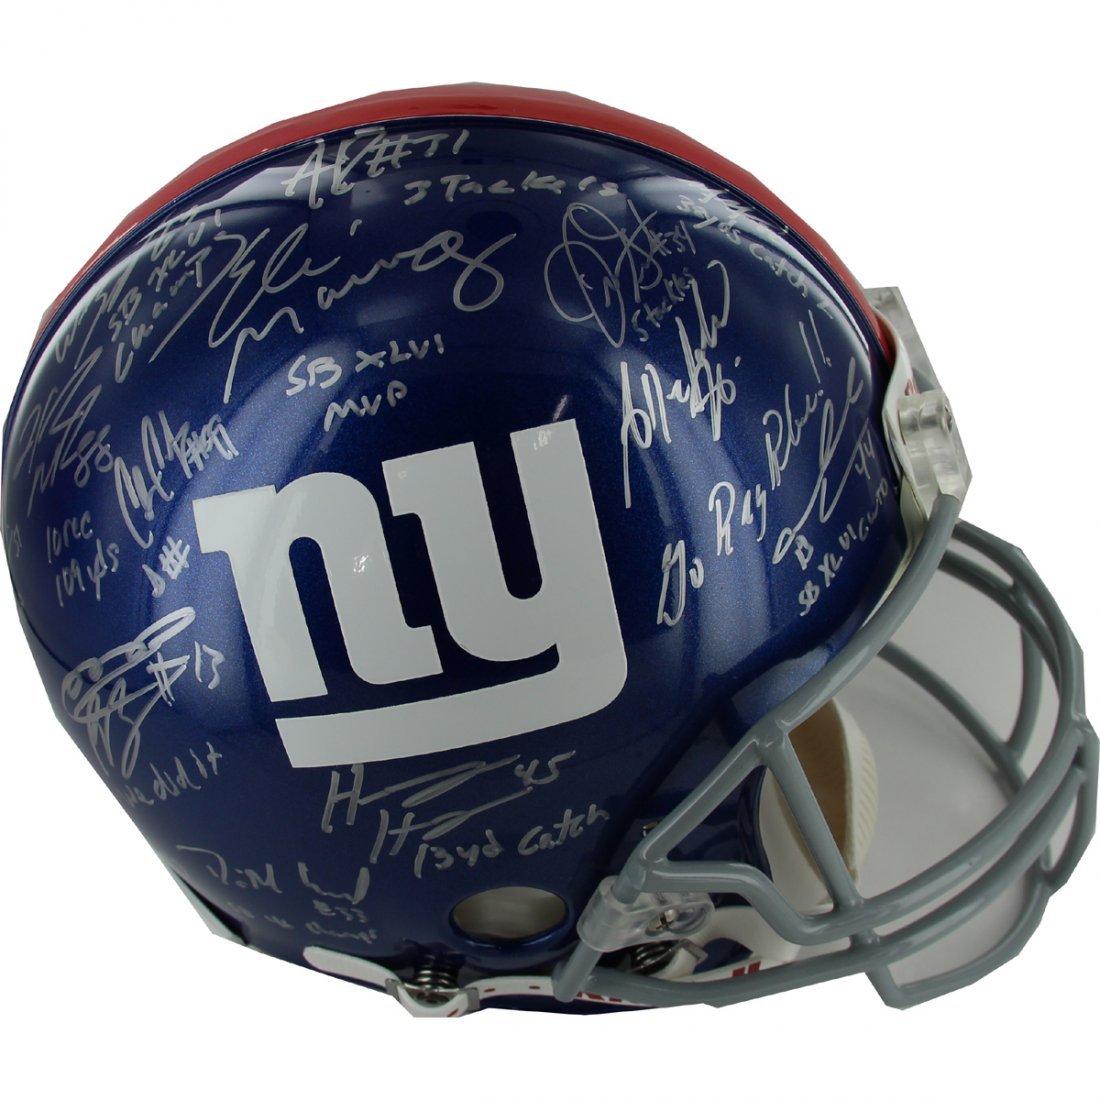 2011 New York Giants Team Signed Authentic Helmet w/ In